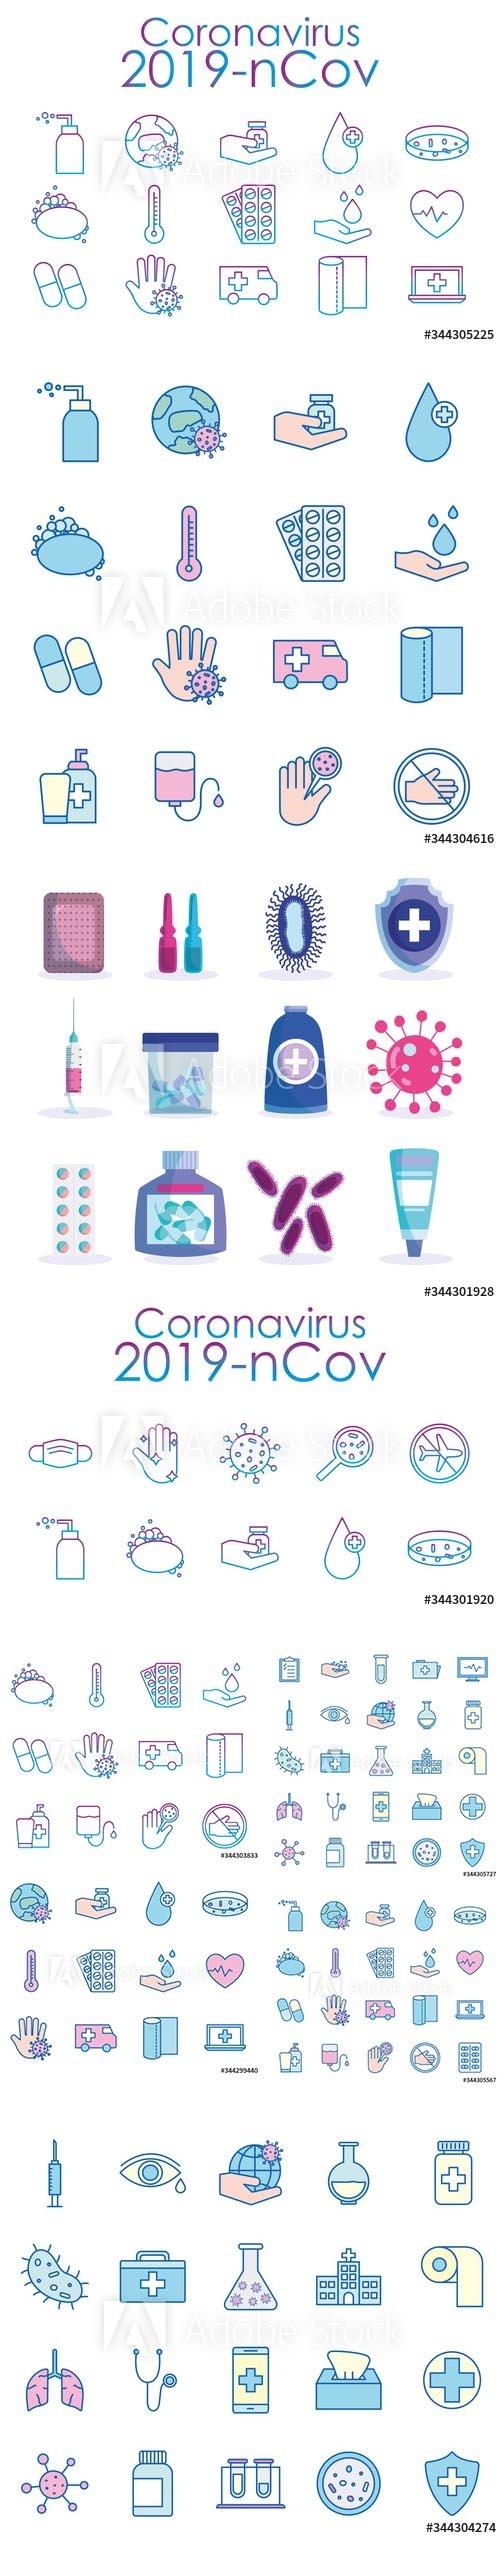 Covid 19 virus icon Vector set